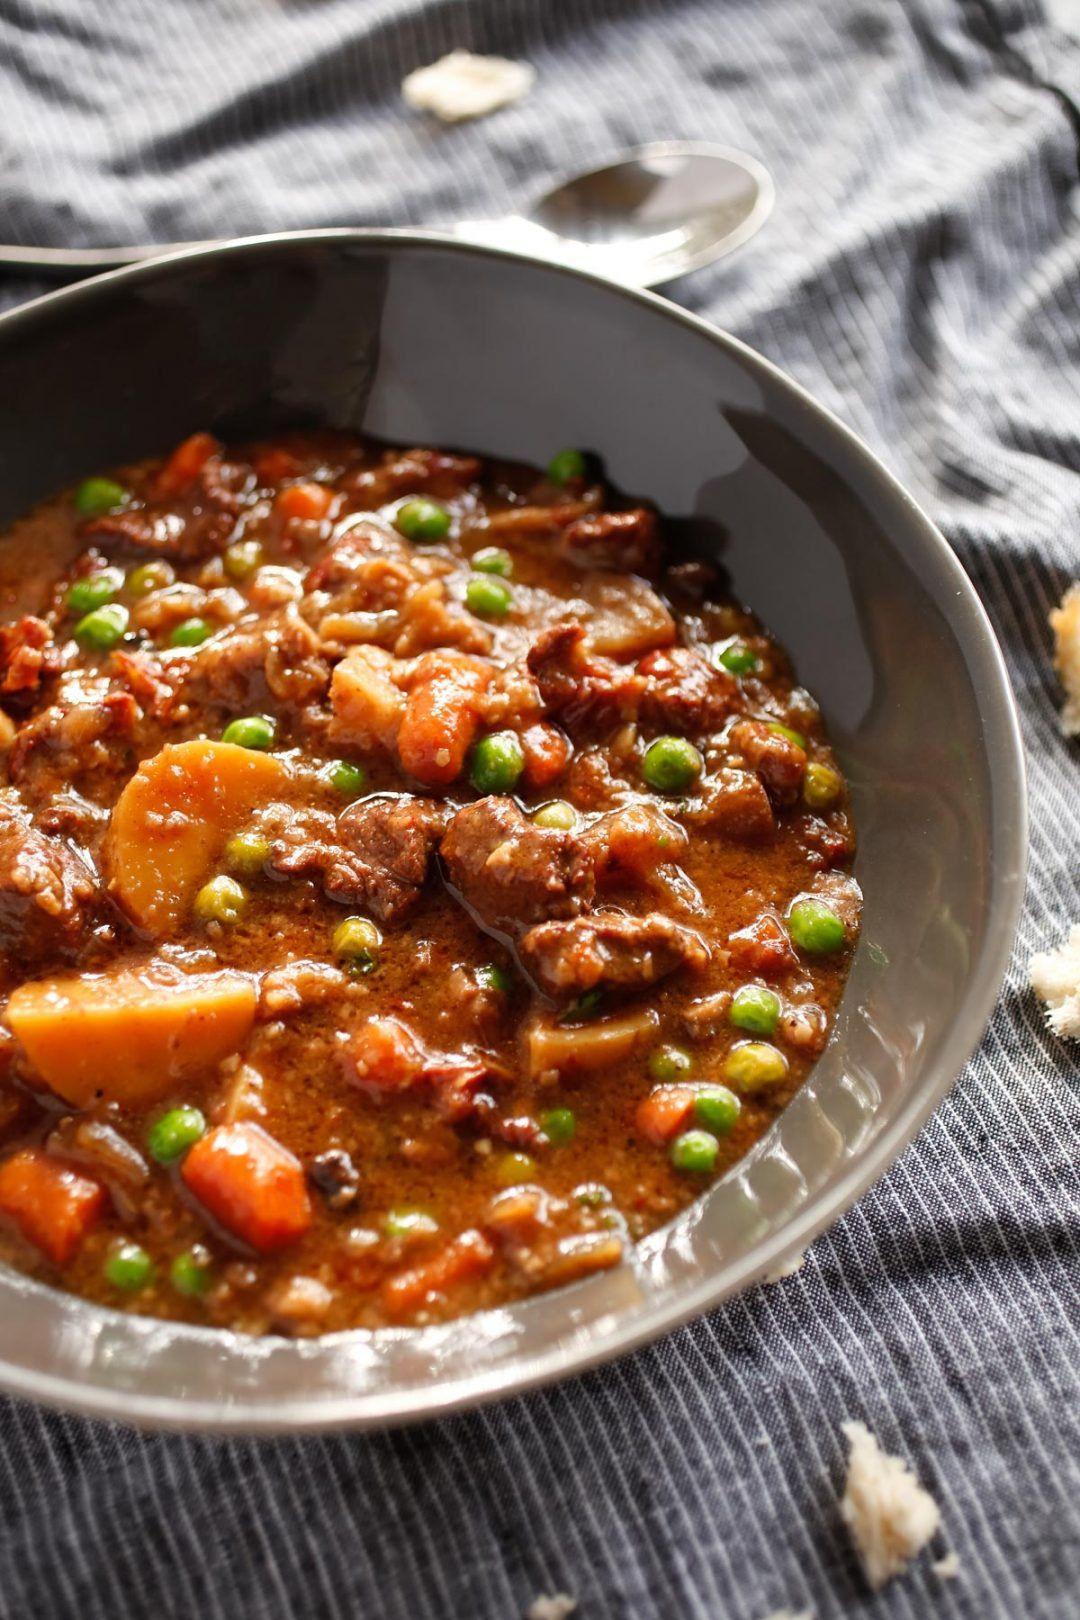 Ina Garten S Unforgettable Beef Stew Veggies By Candlelight Recipe Stew Recipes Beef Recipes Ina Garten Recipes